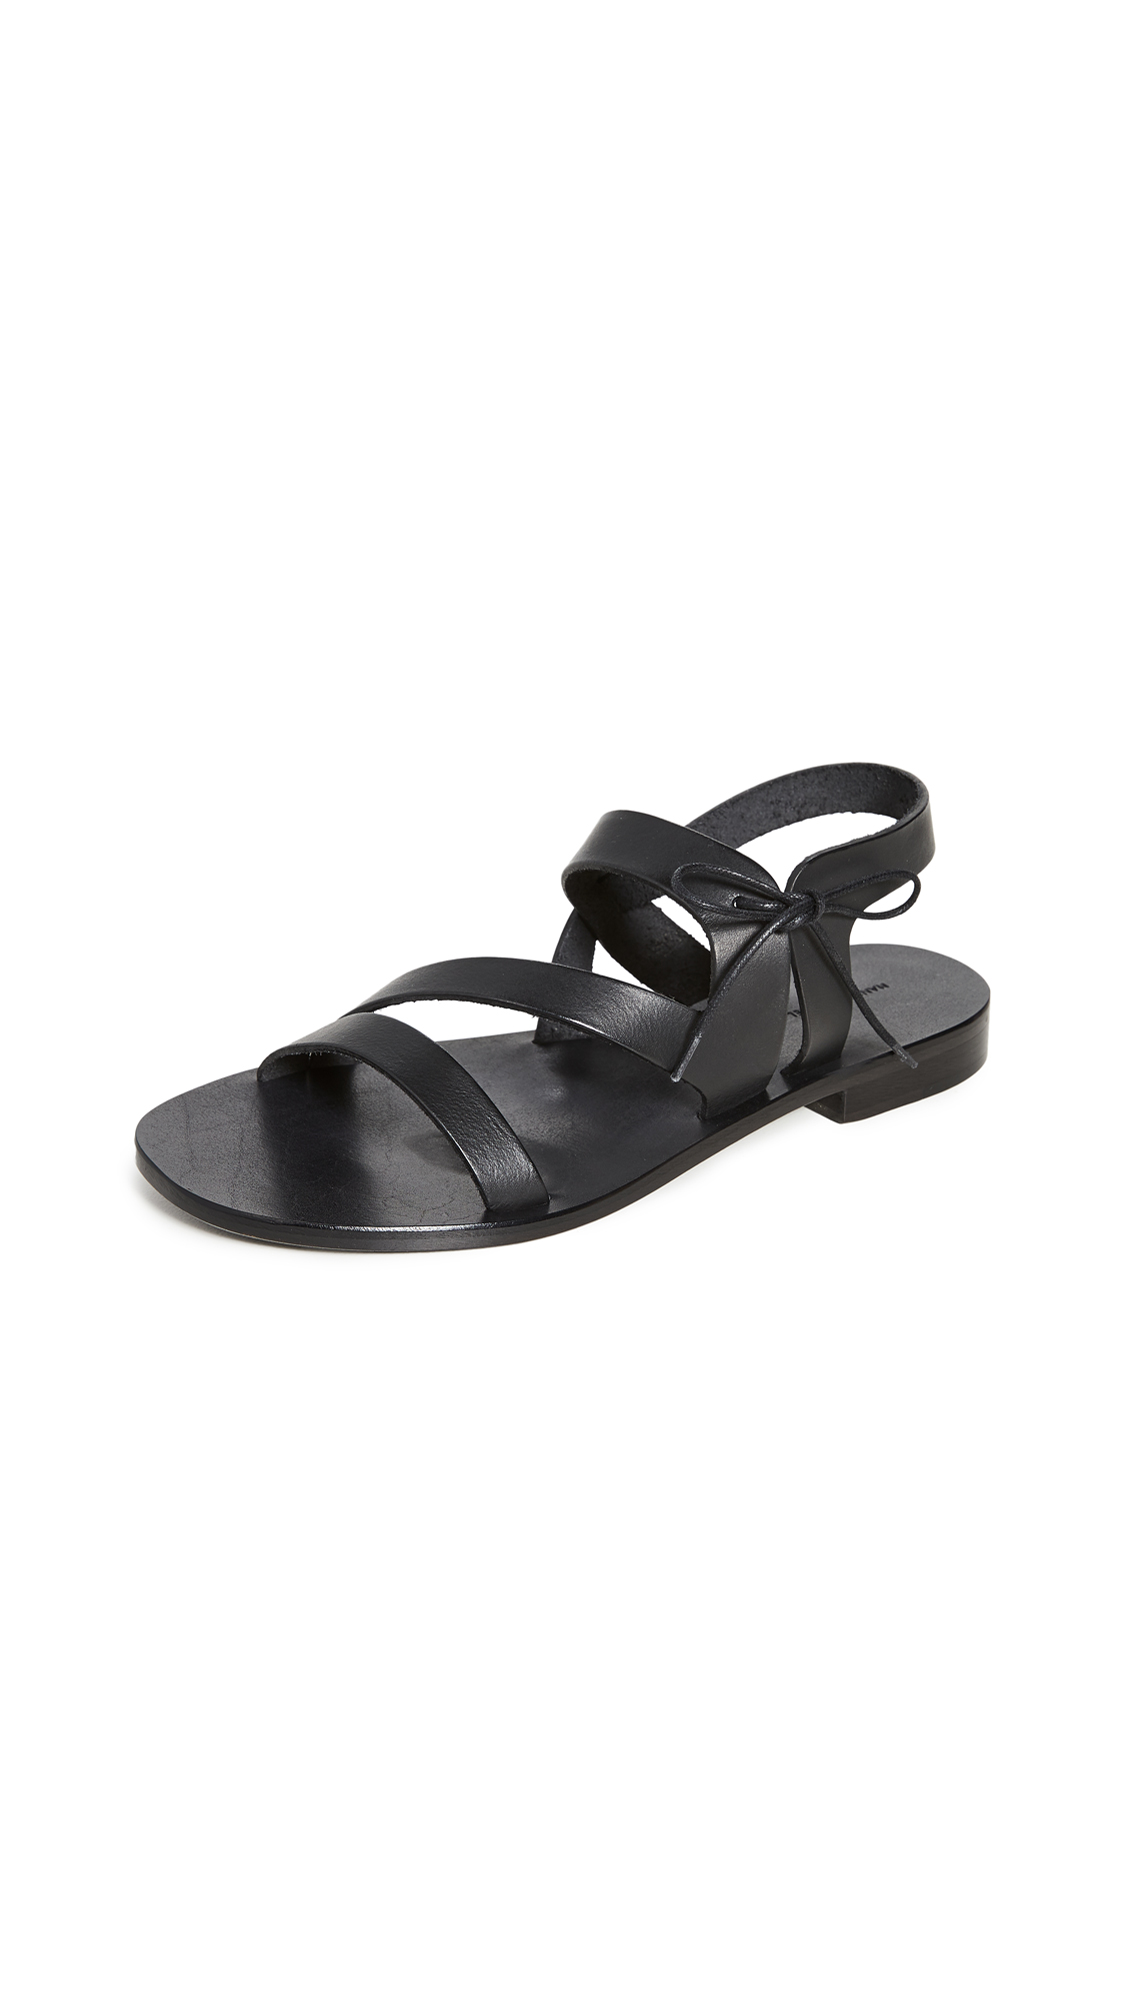 Mansur Gavriel Tie Sandals - 30% Off Sale